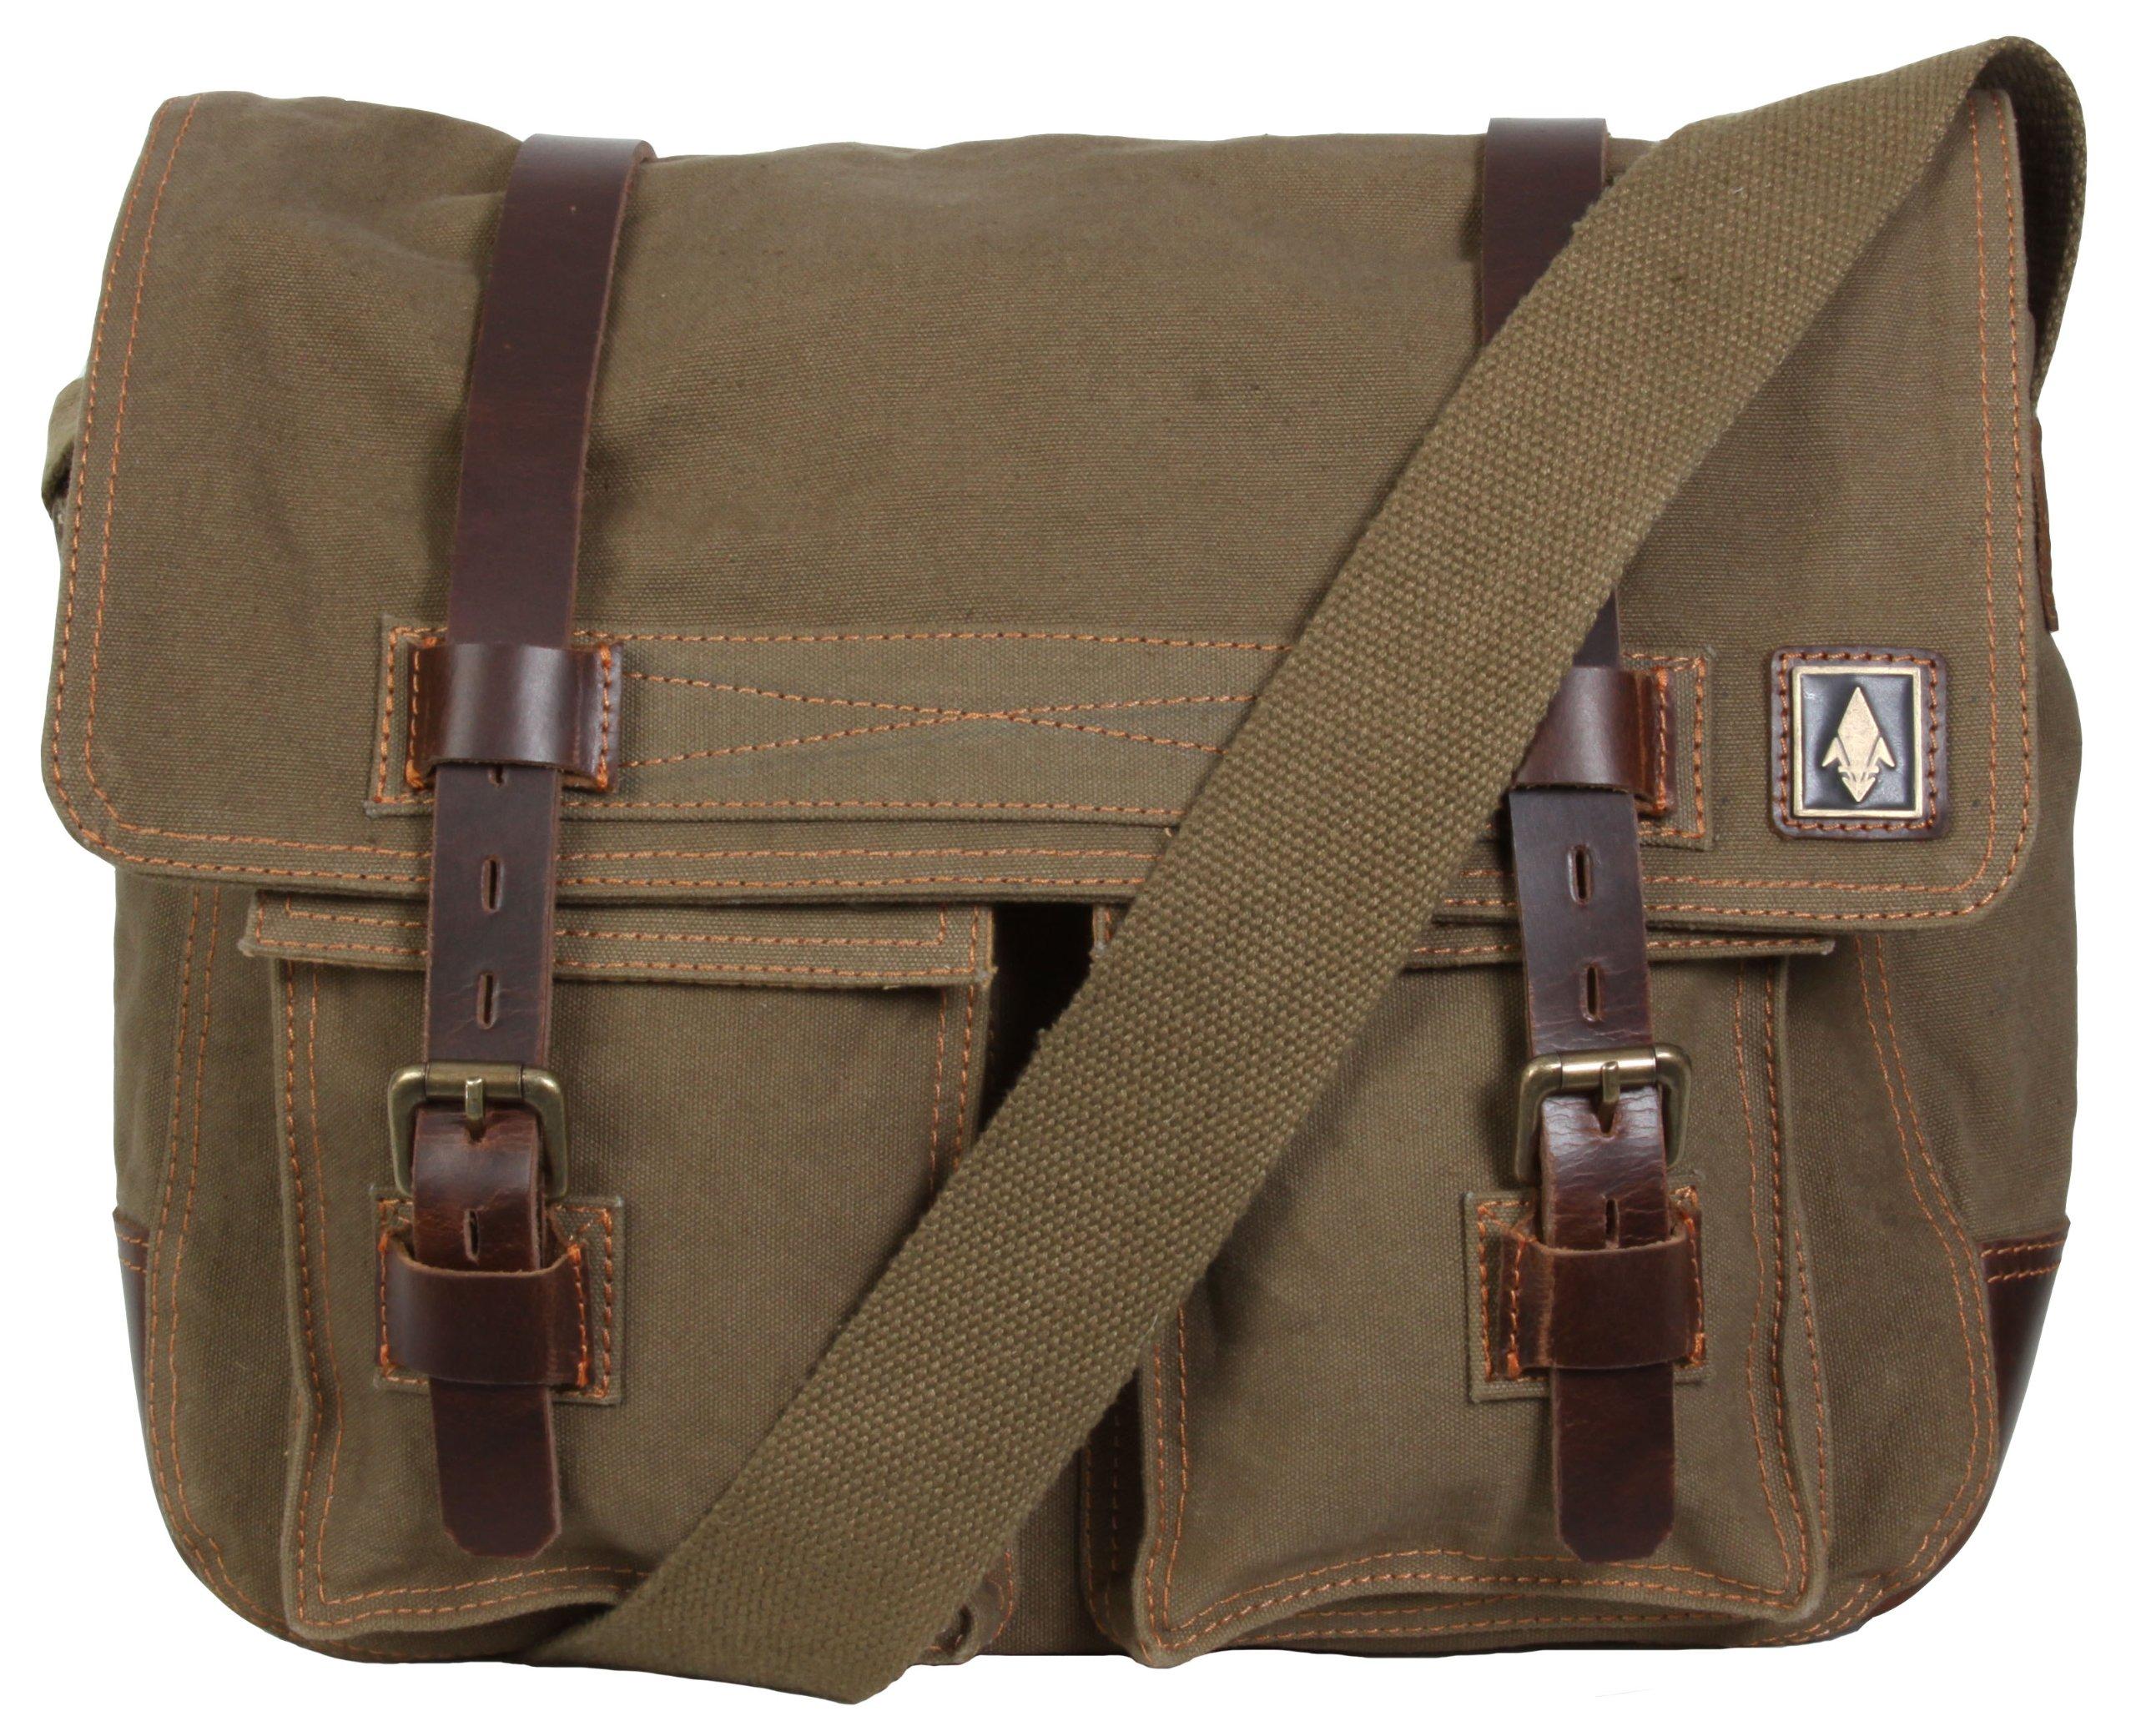 DamnDog Haversack 16.5'' Canvas Flapover Messenger Bag - Swamp Brown